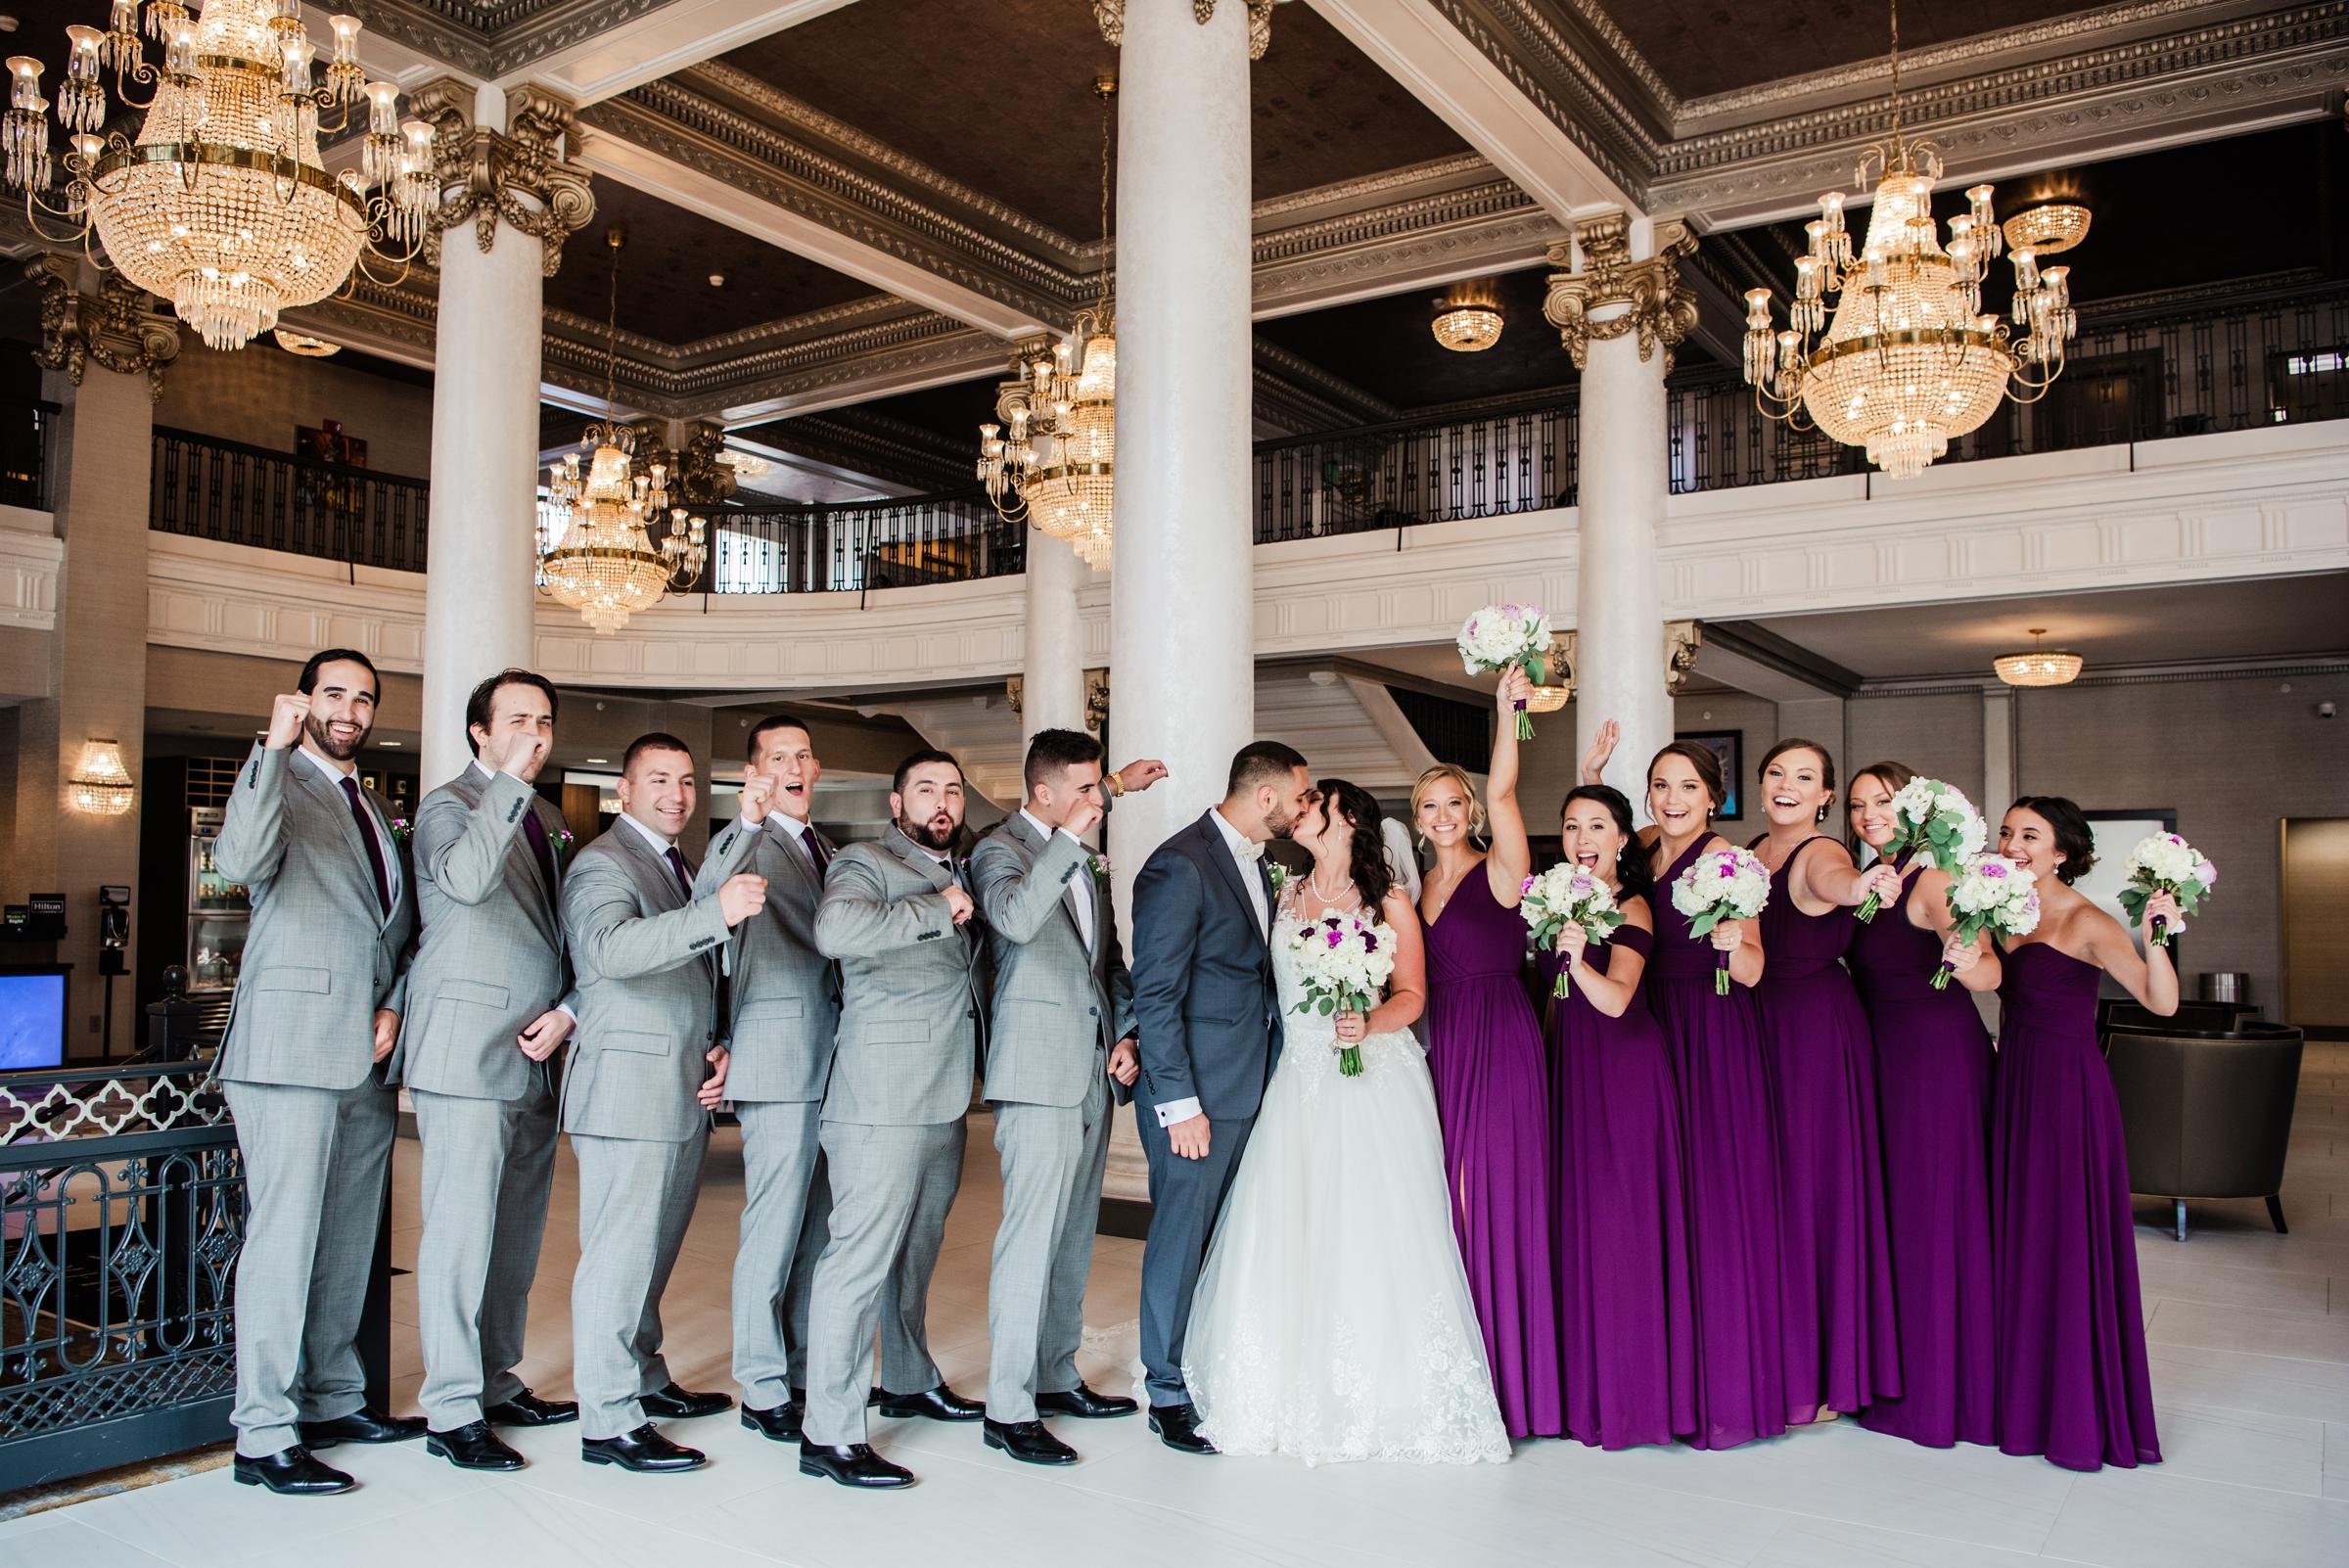 Historic_Old_St_Johns_Church_Valentinos_Banquet_Hall_Central_NY_Wedding_JILL_STUDIO_Rochester_NY_Photographer_DSC_6019.jpg